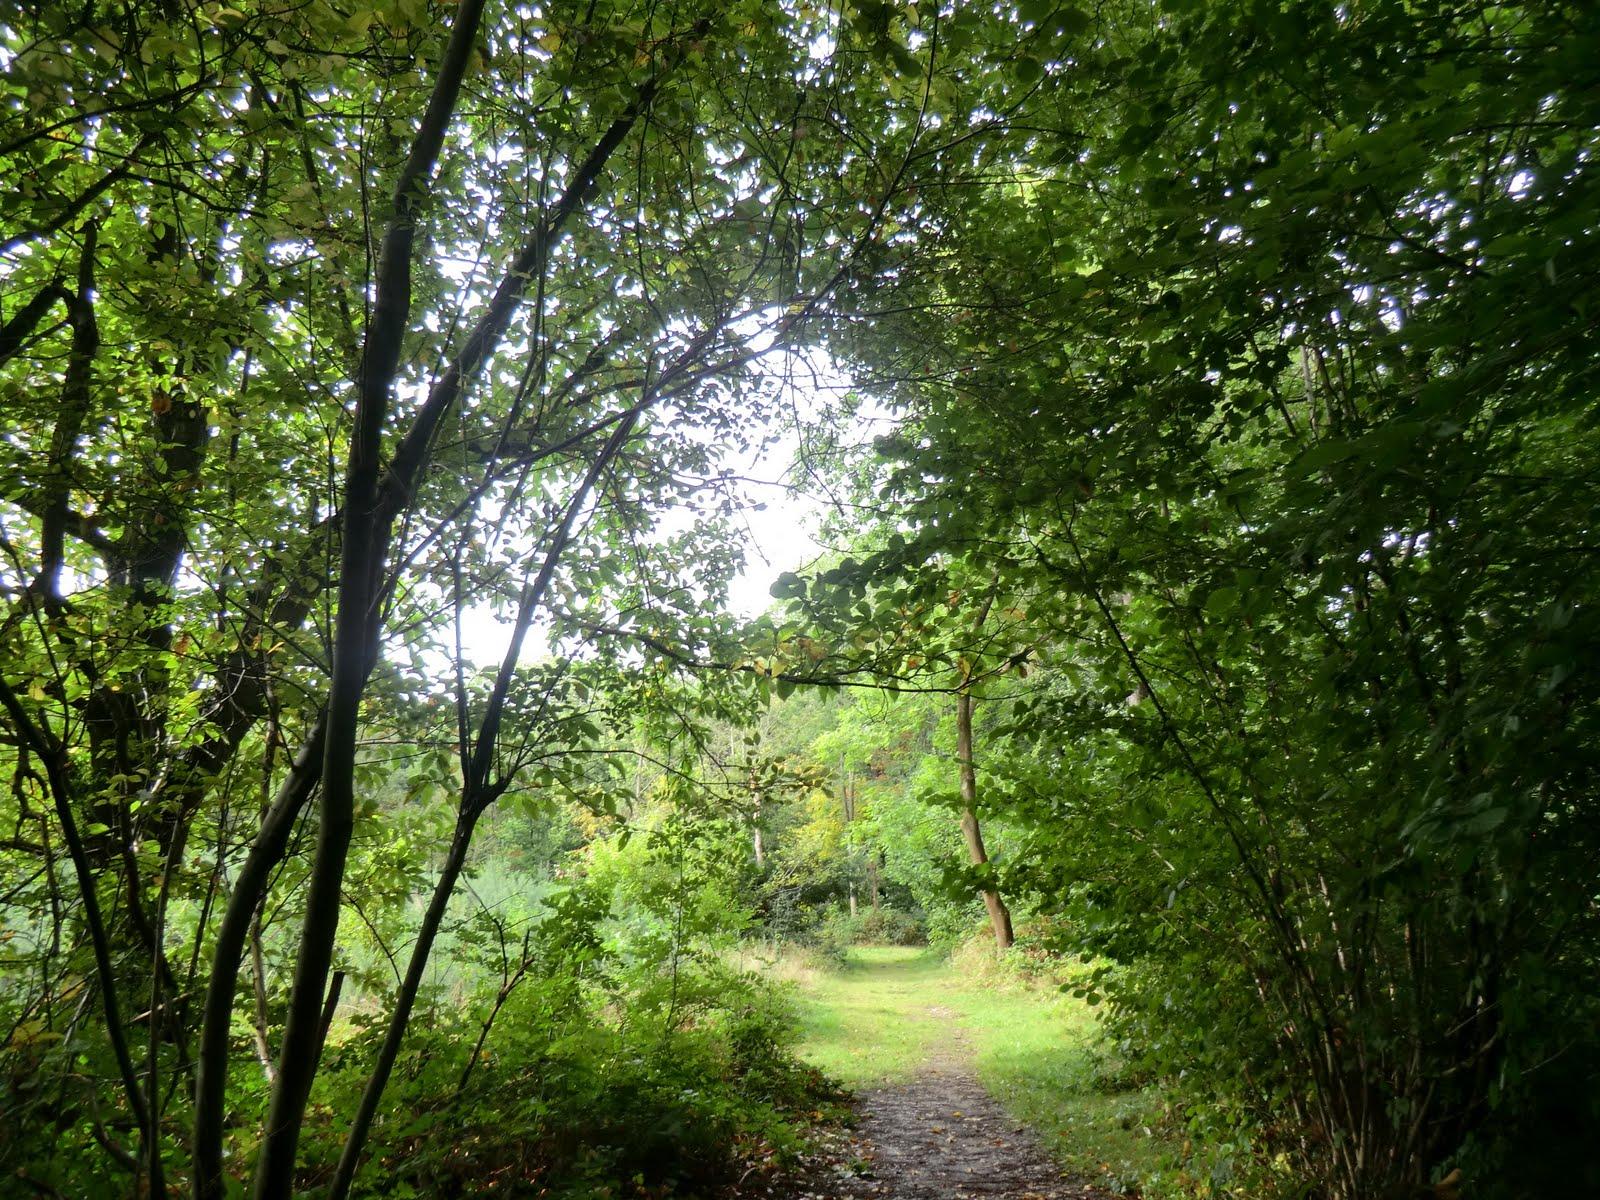 CIMG4231 Selsdon Wood